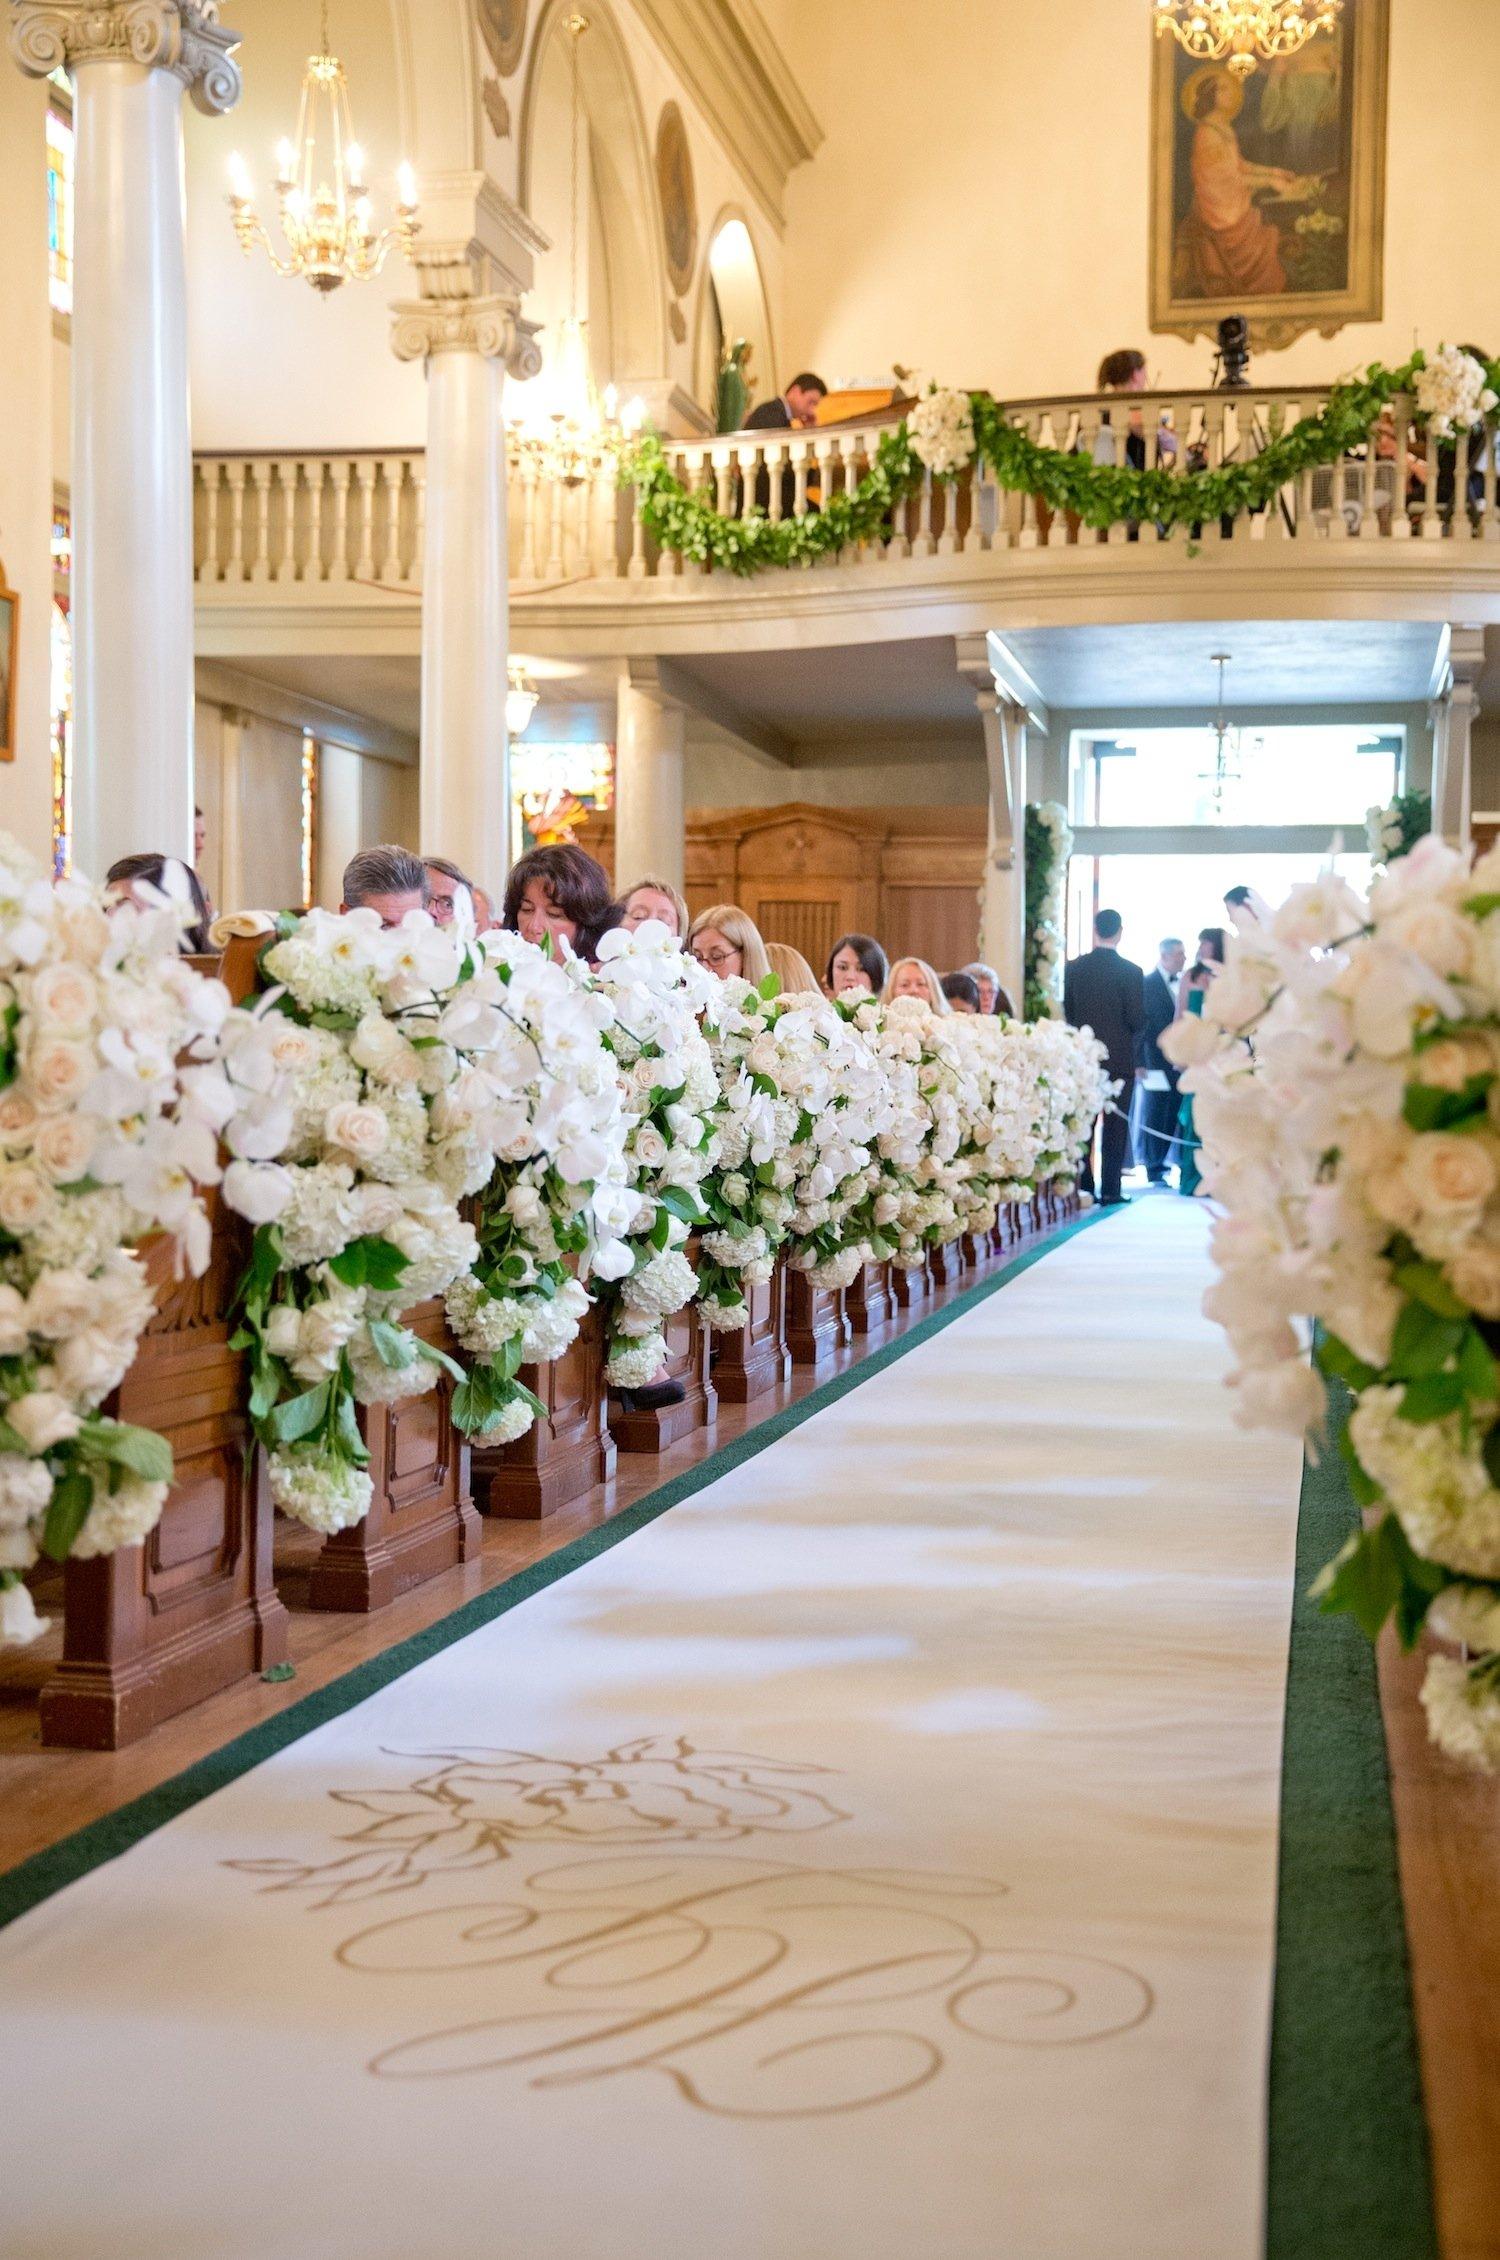 10 Great Wedding Decoration Ideas For Church wedding ceremony ideas 13 decor ideas for a church wedding inside 2020